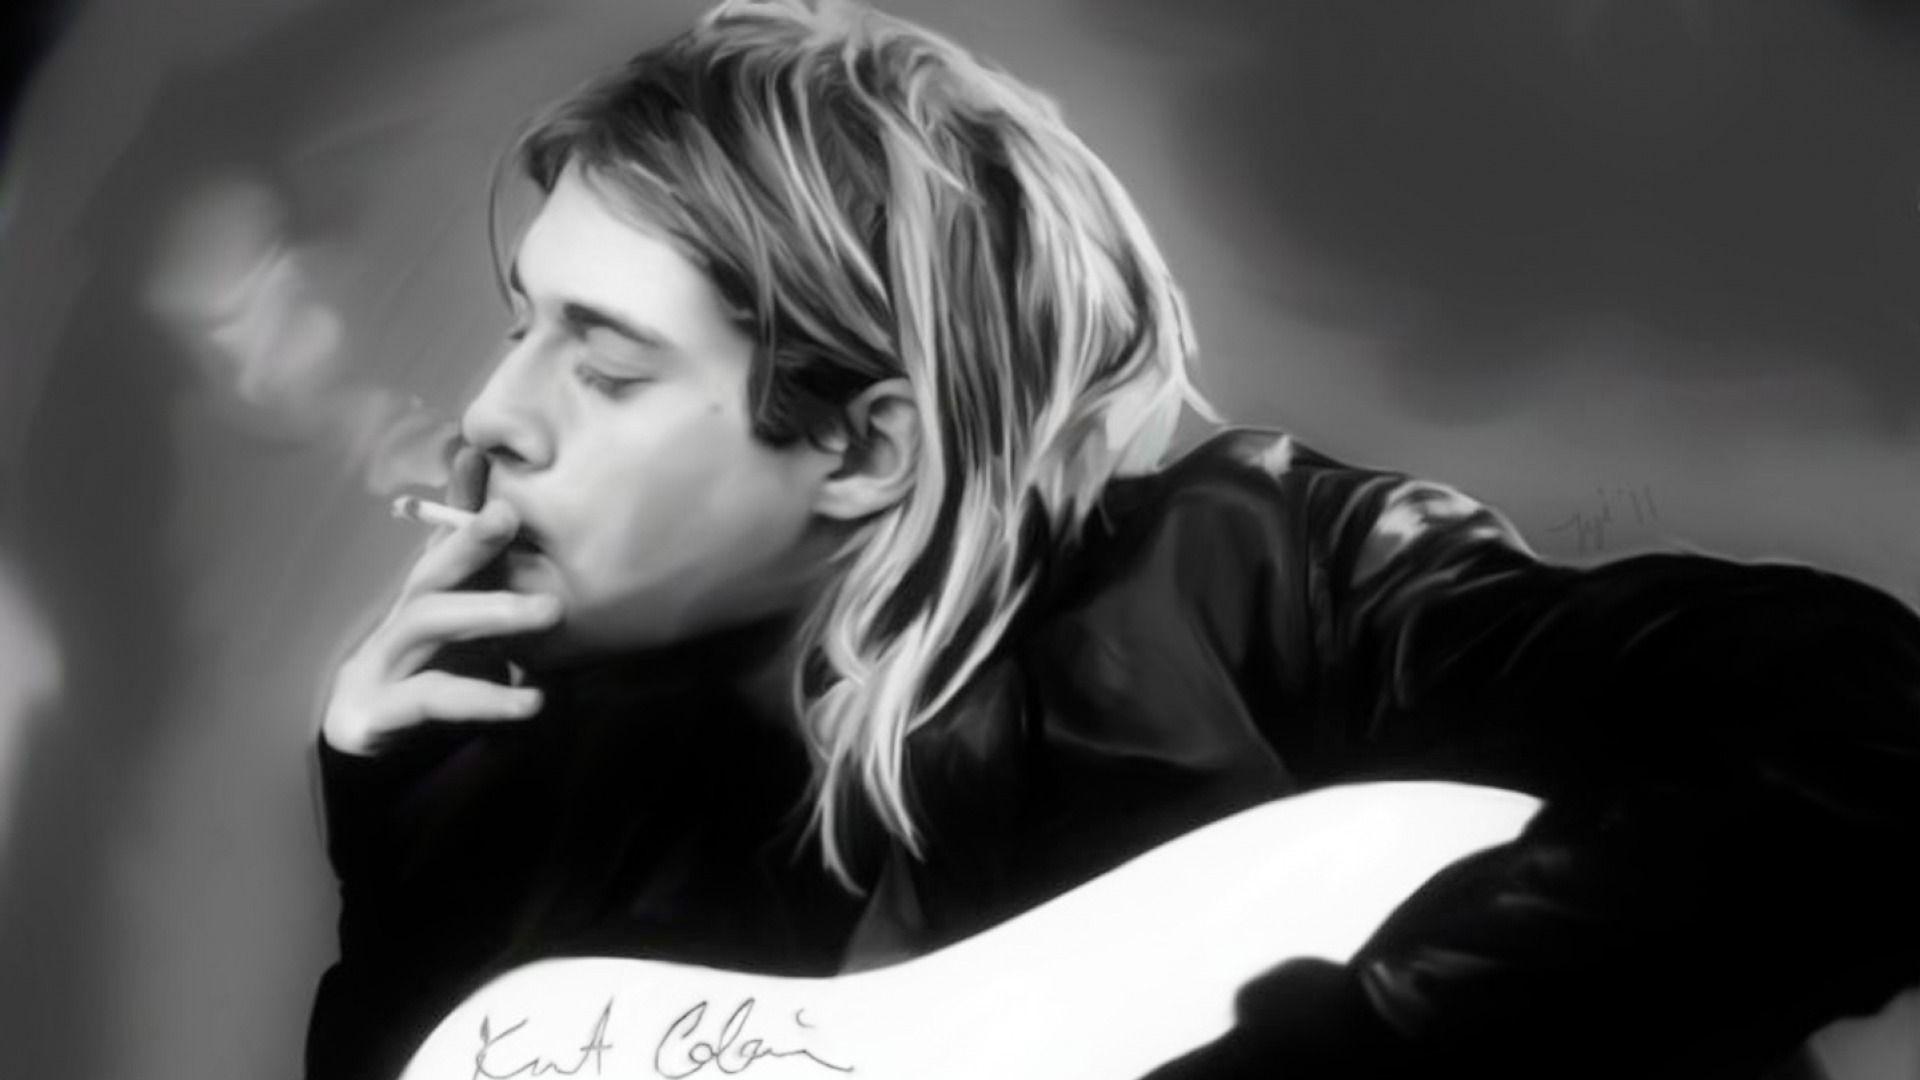 Kurt cobain background wallpapertag - Kurt cobain nirvana wallpaper ...